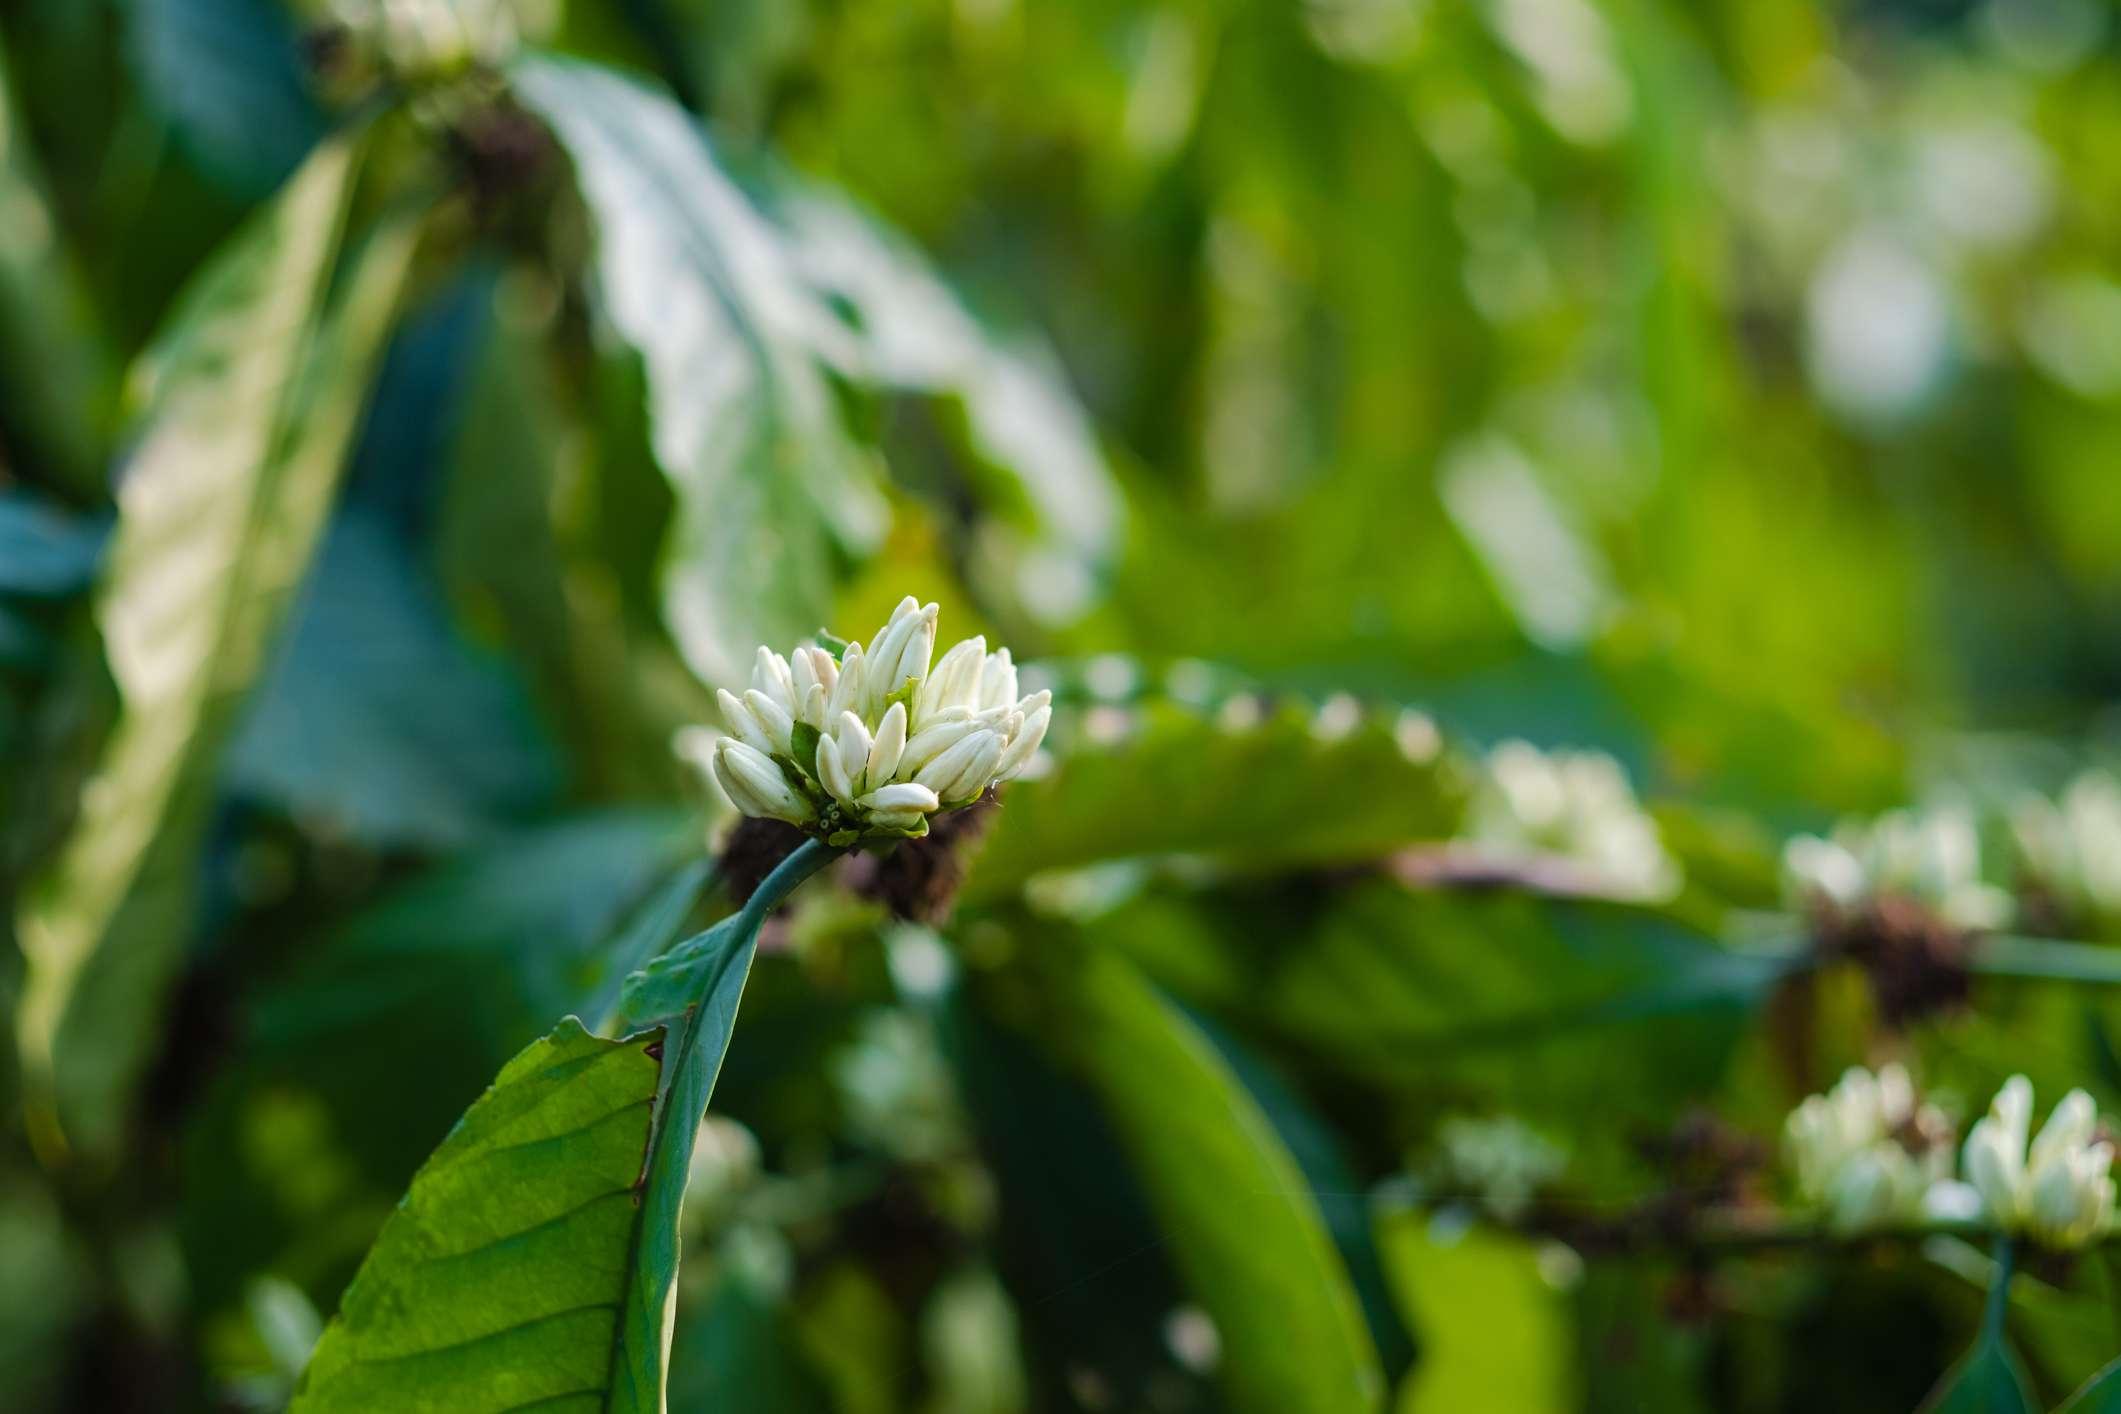 Blooming coffee plant leaves